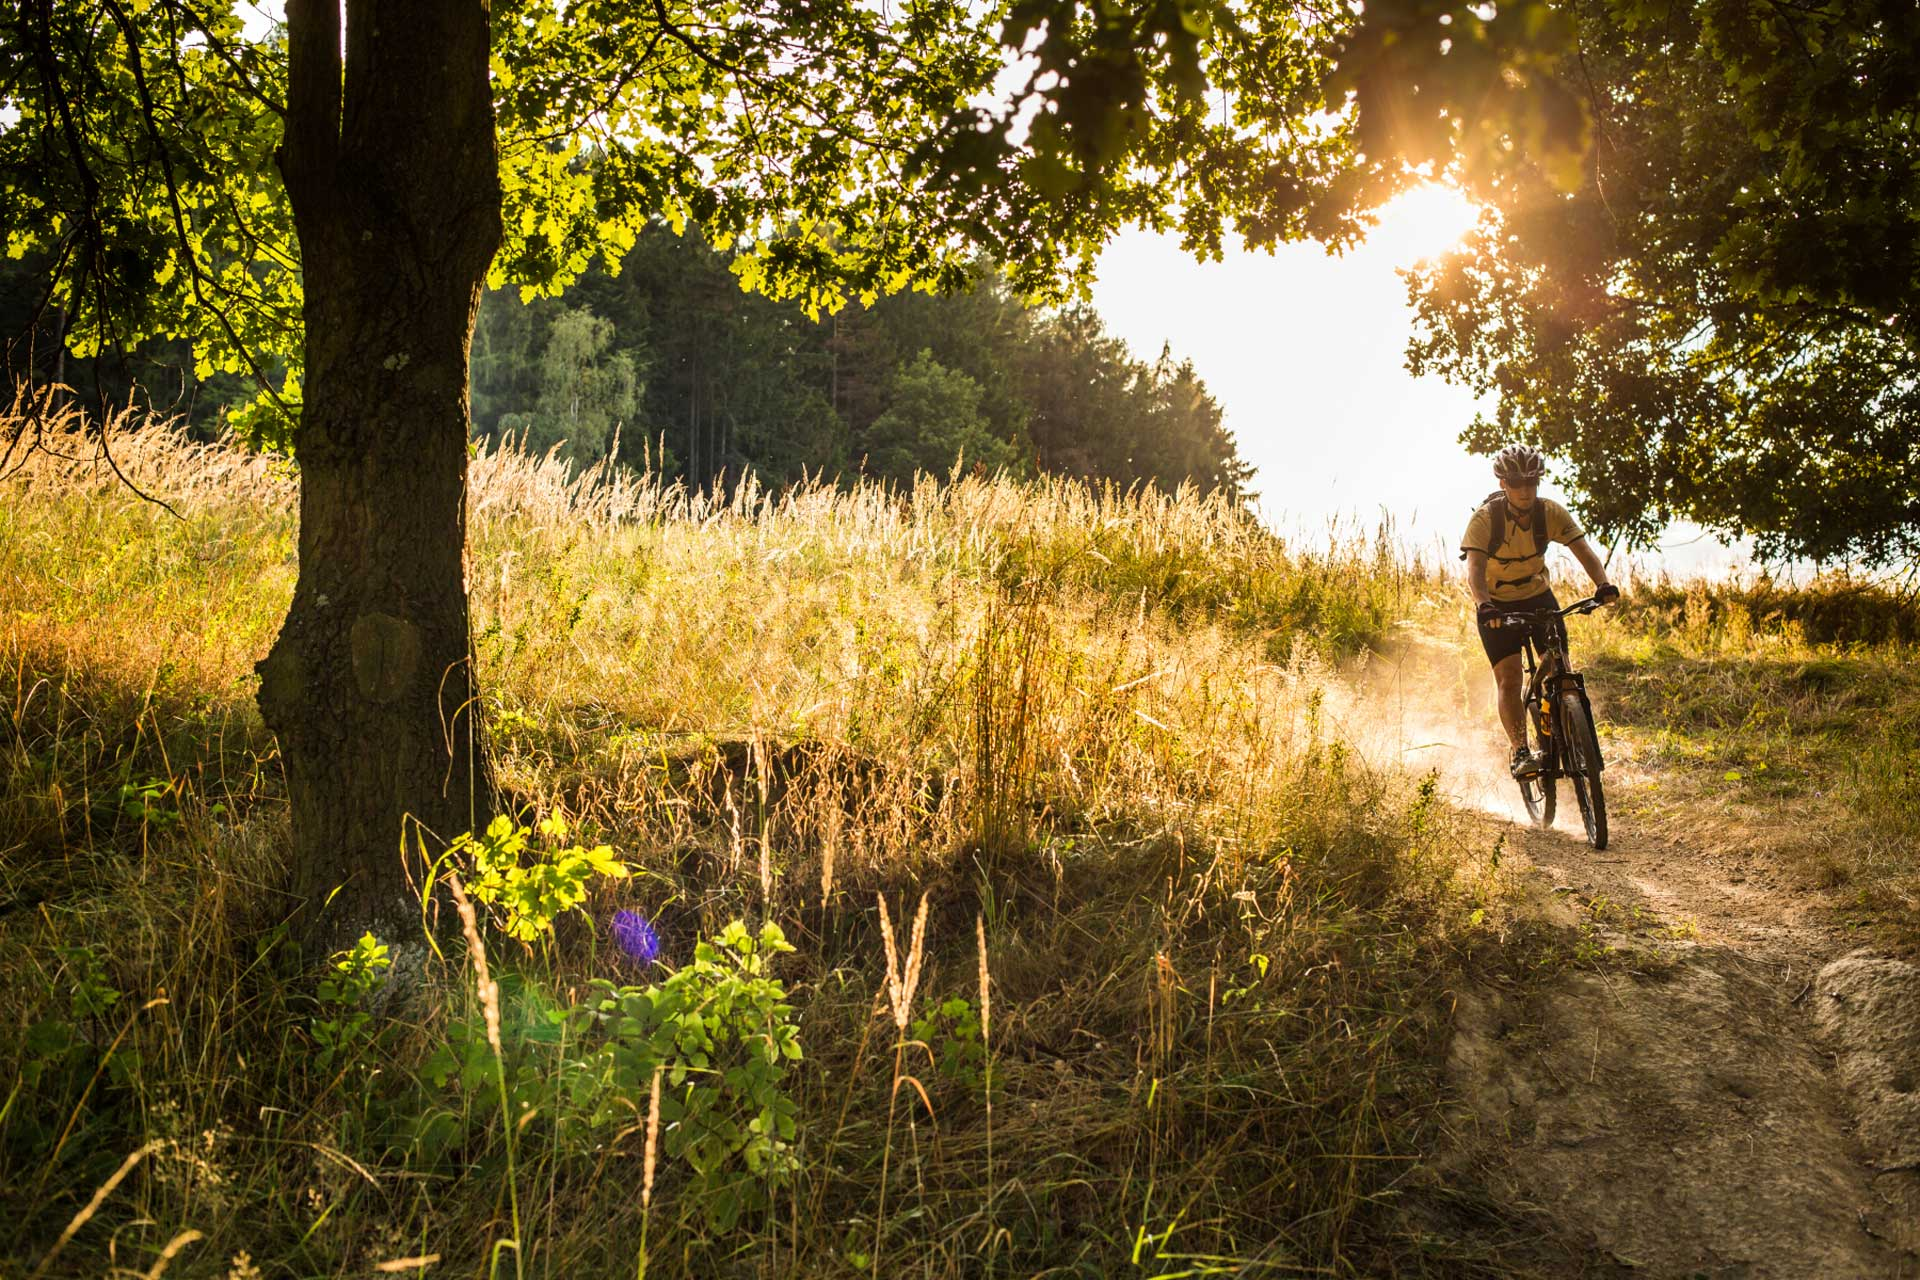 Cyklist på mountainbike i sommarlandskap. Fotograf: Mostphotos